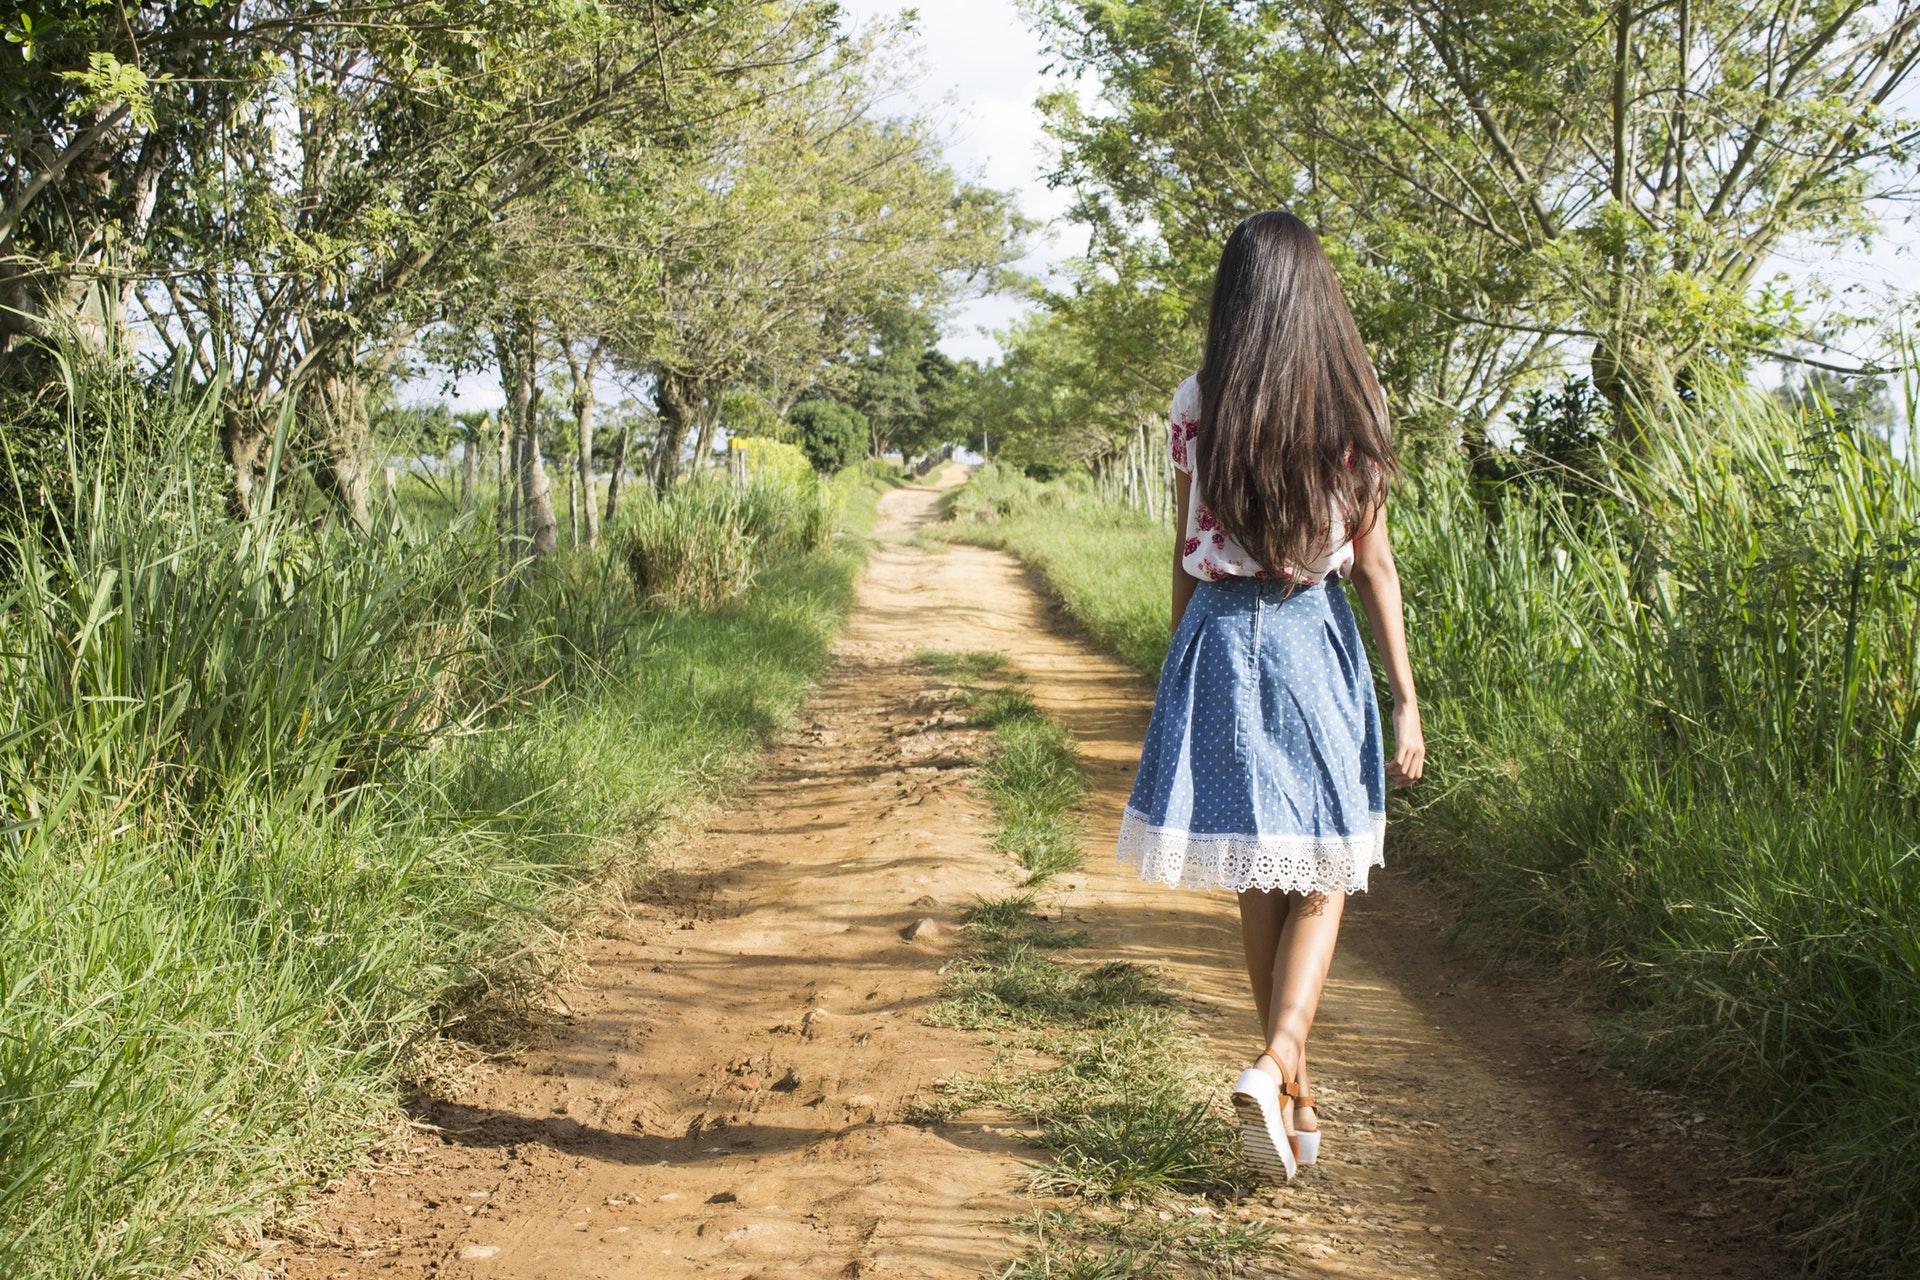 teenage daughter walking down a dirt track